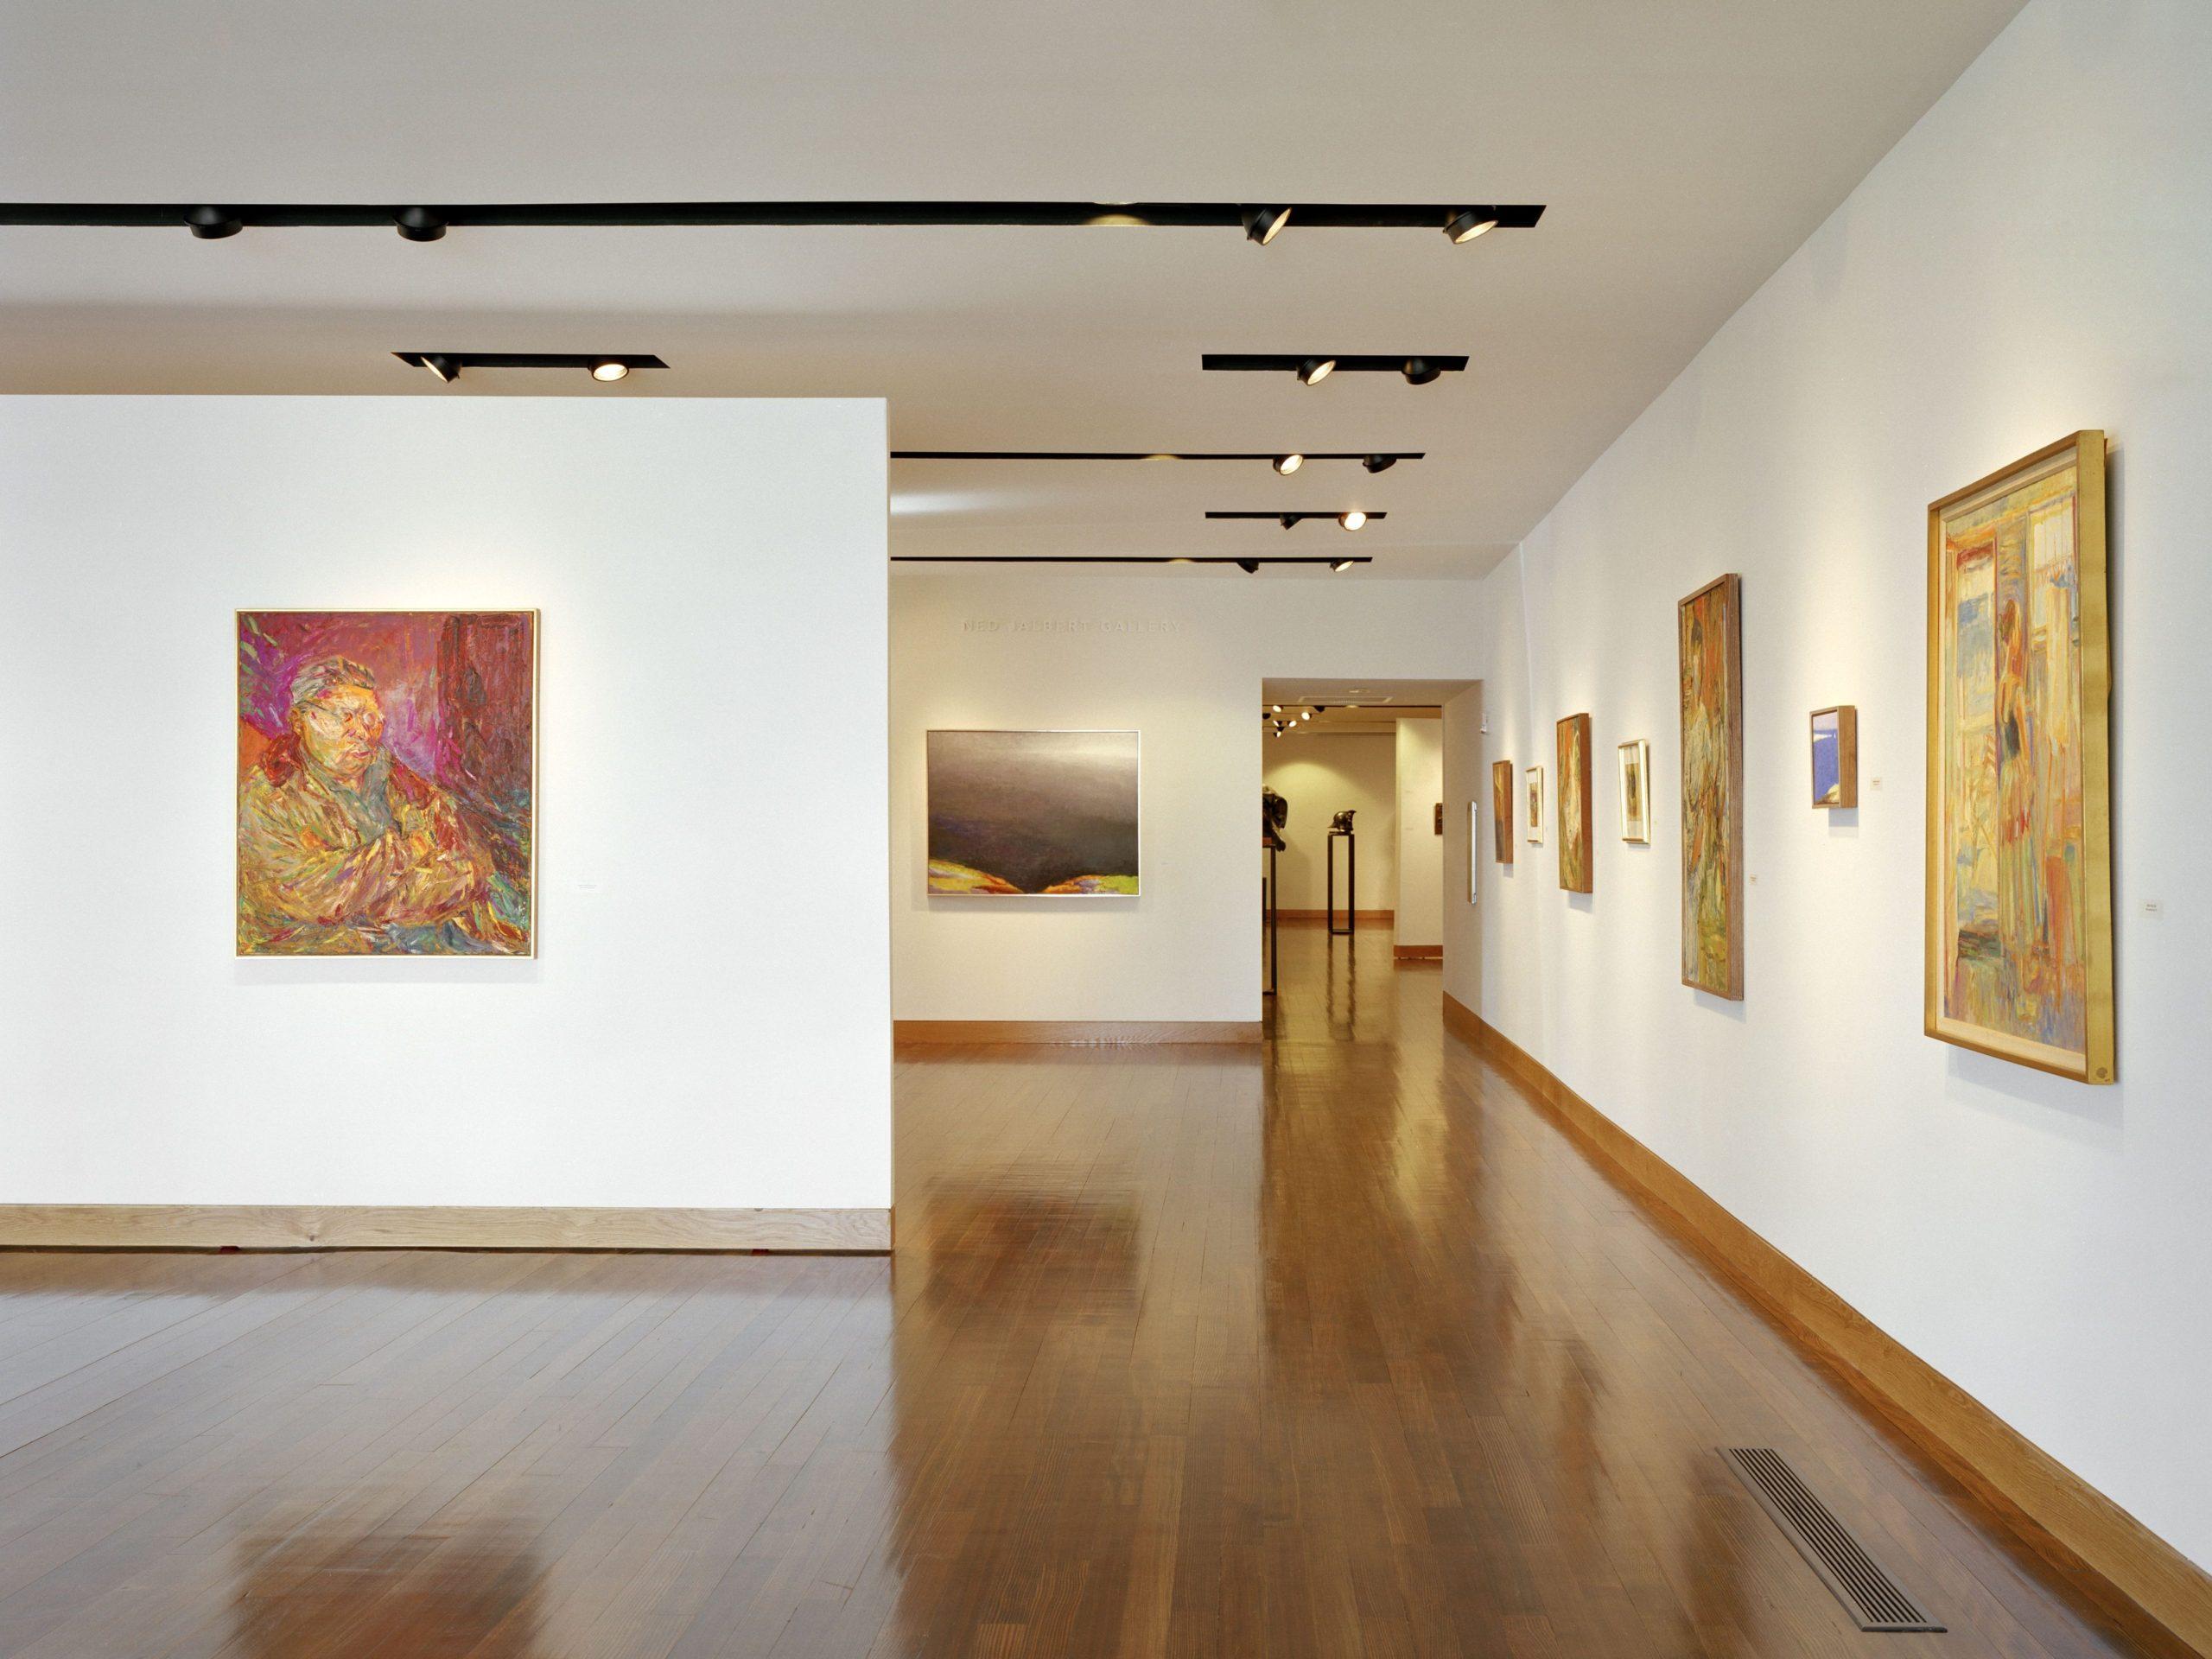 Interior shot of the Patrons Jalbert Galleries